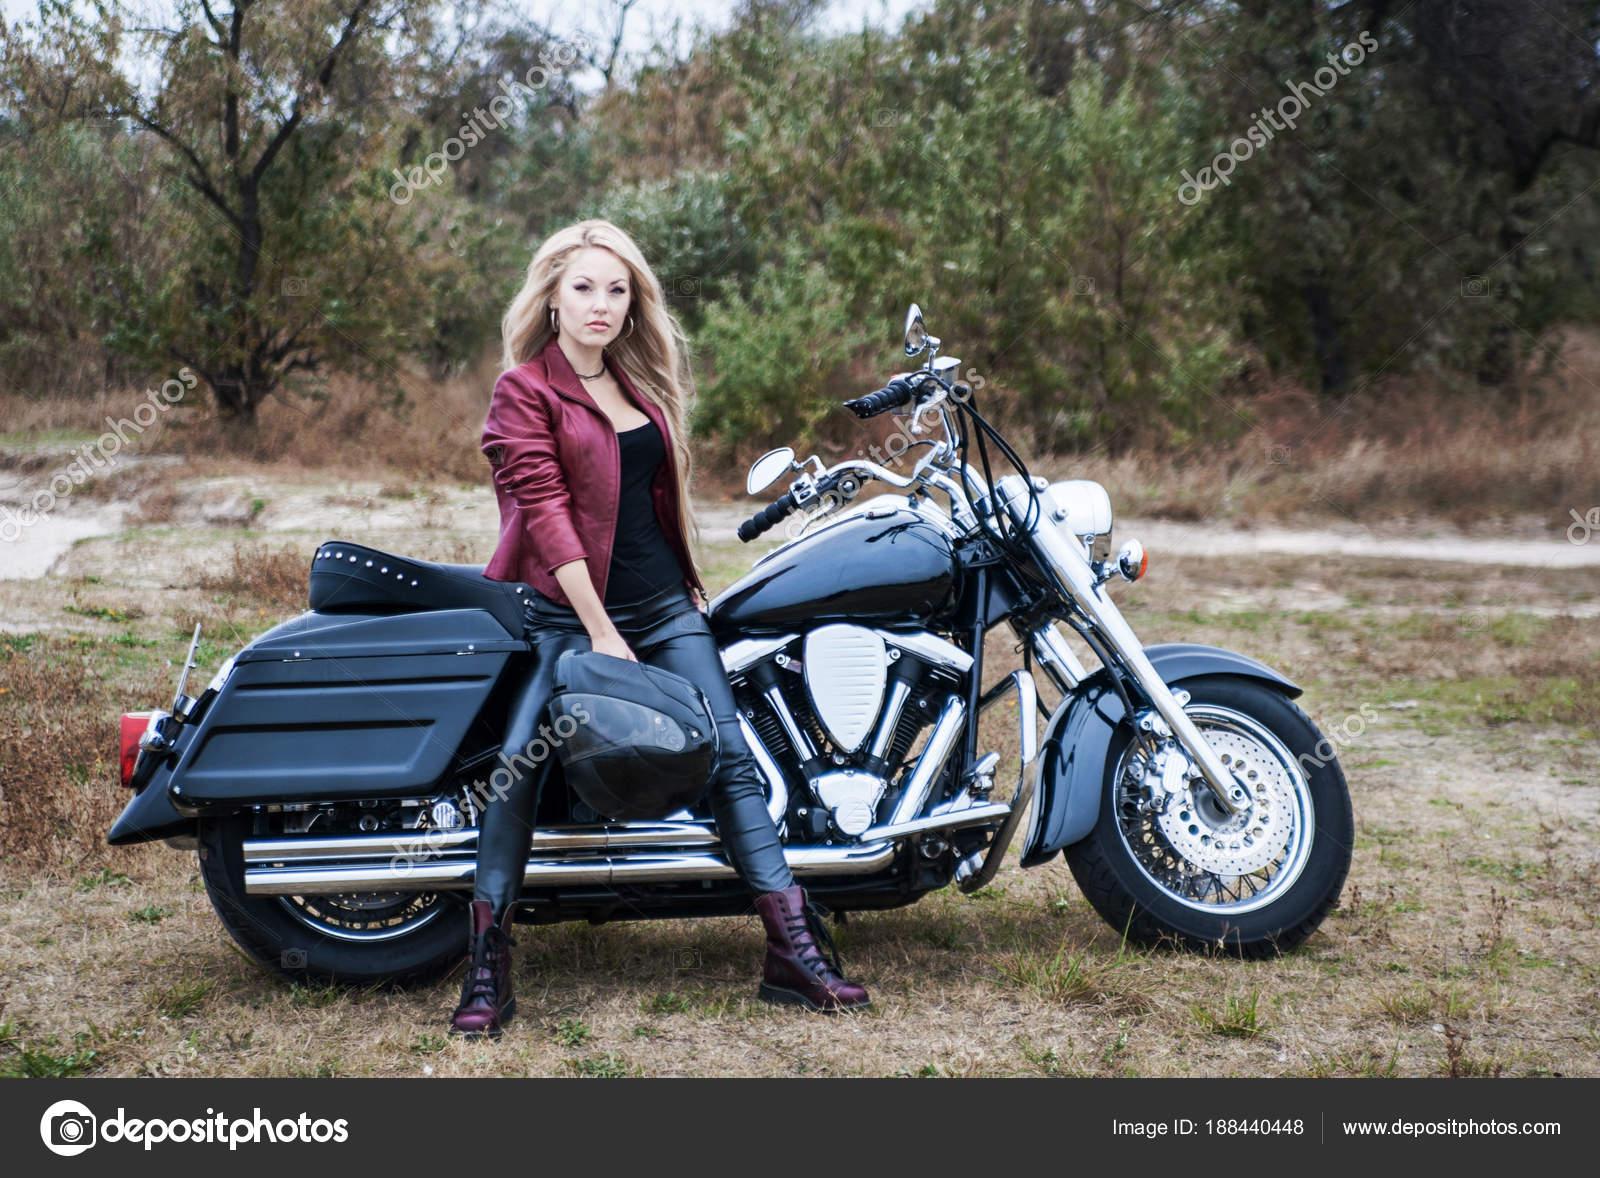 Salutations kissiennes. - Page 21 Depositphotos_188440448-stock-photo-beautiful-biker-woman-motorcycle-outdoor